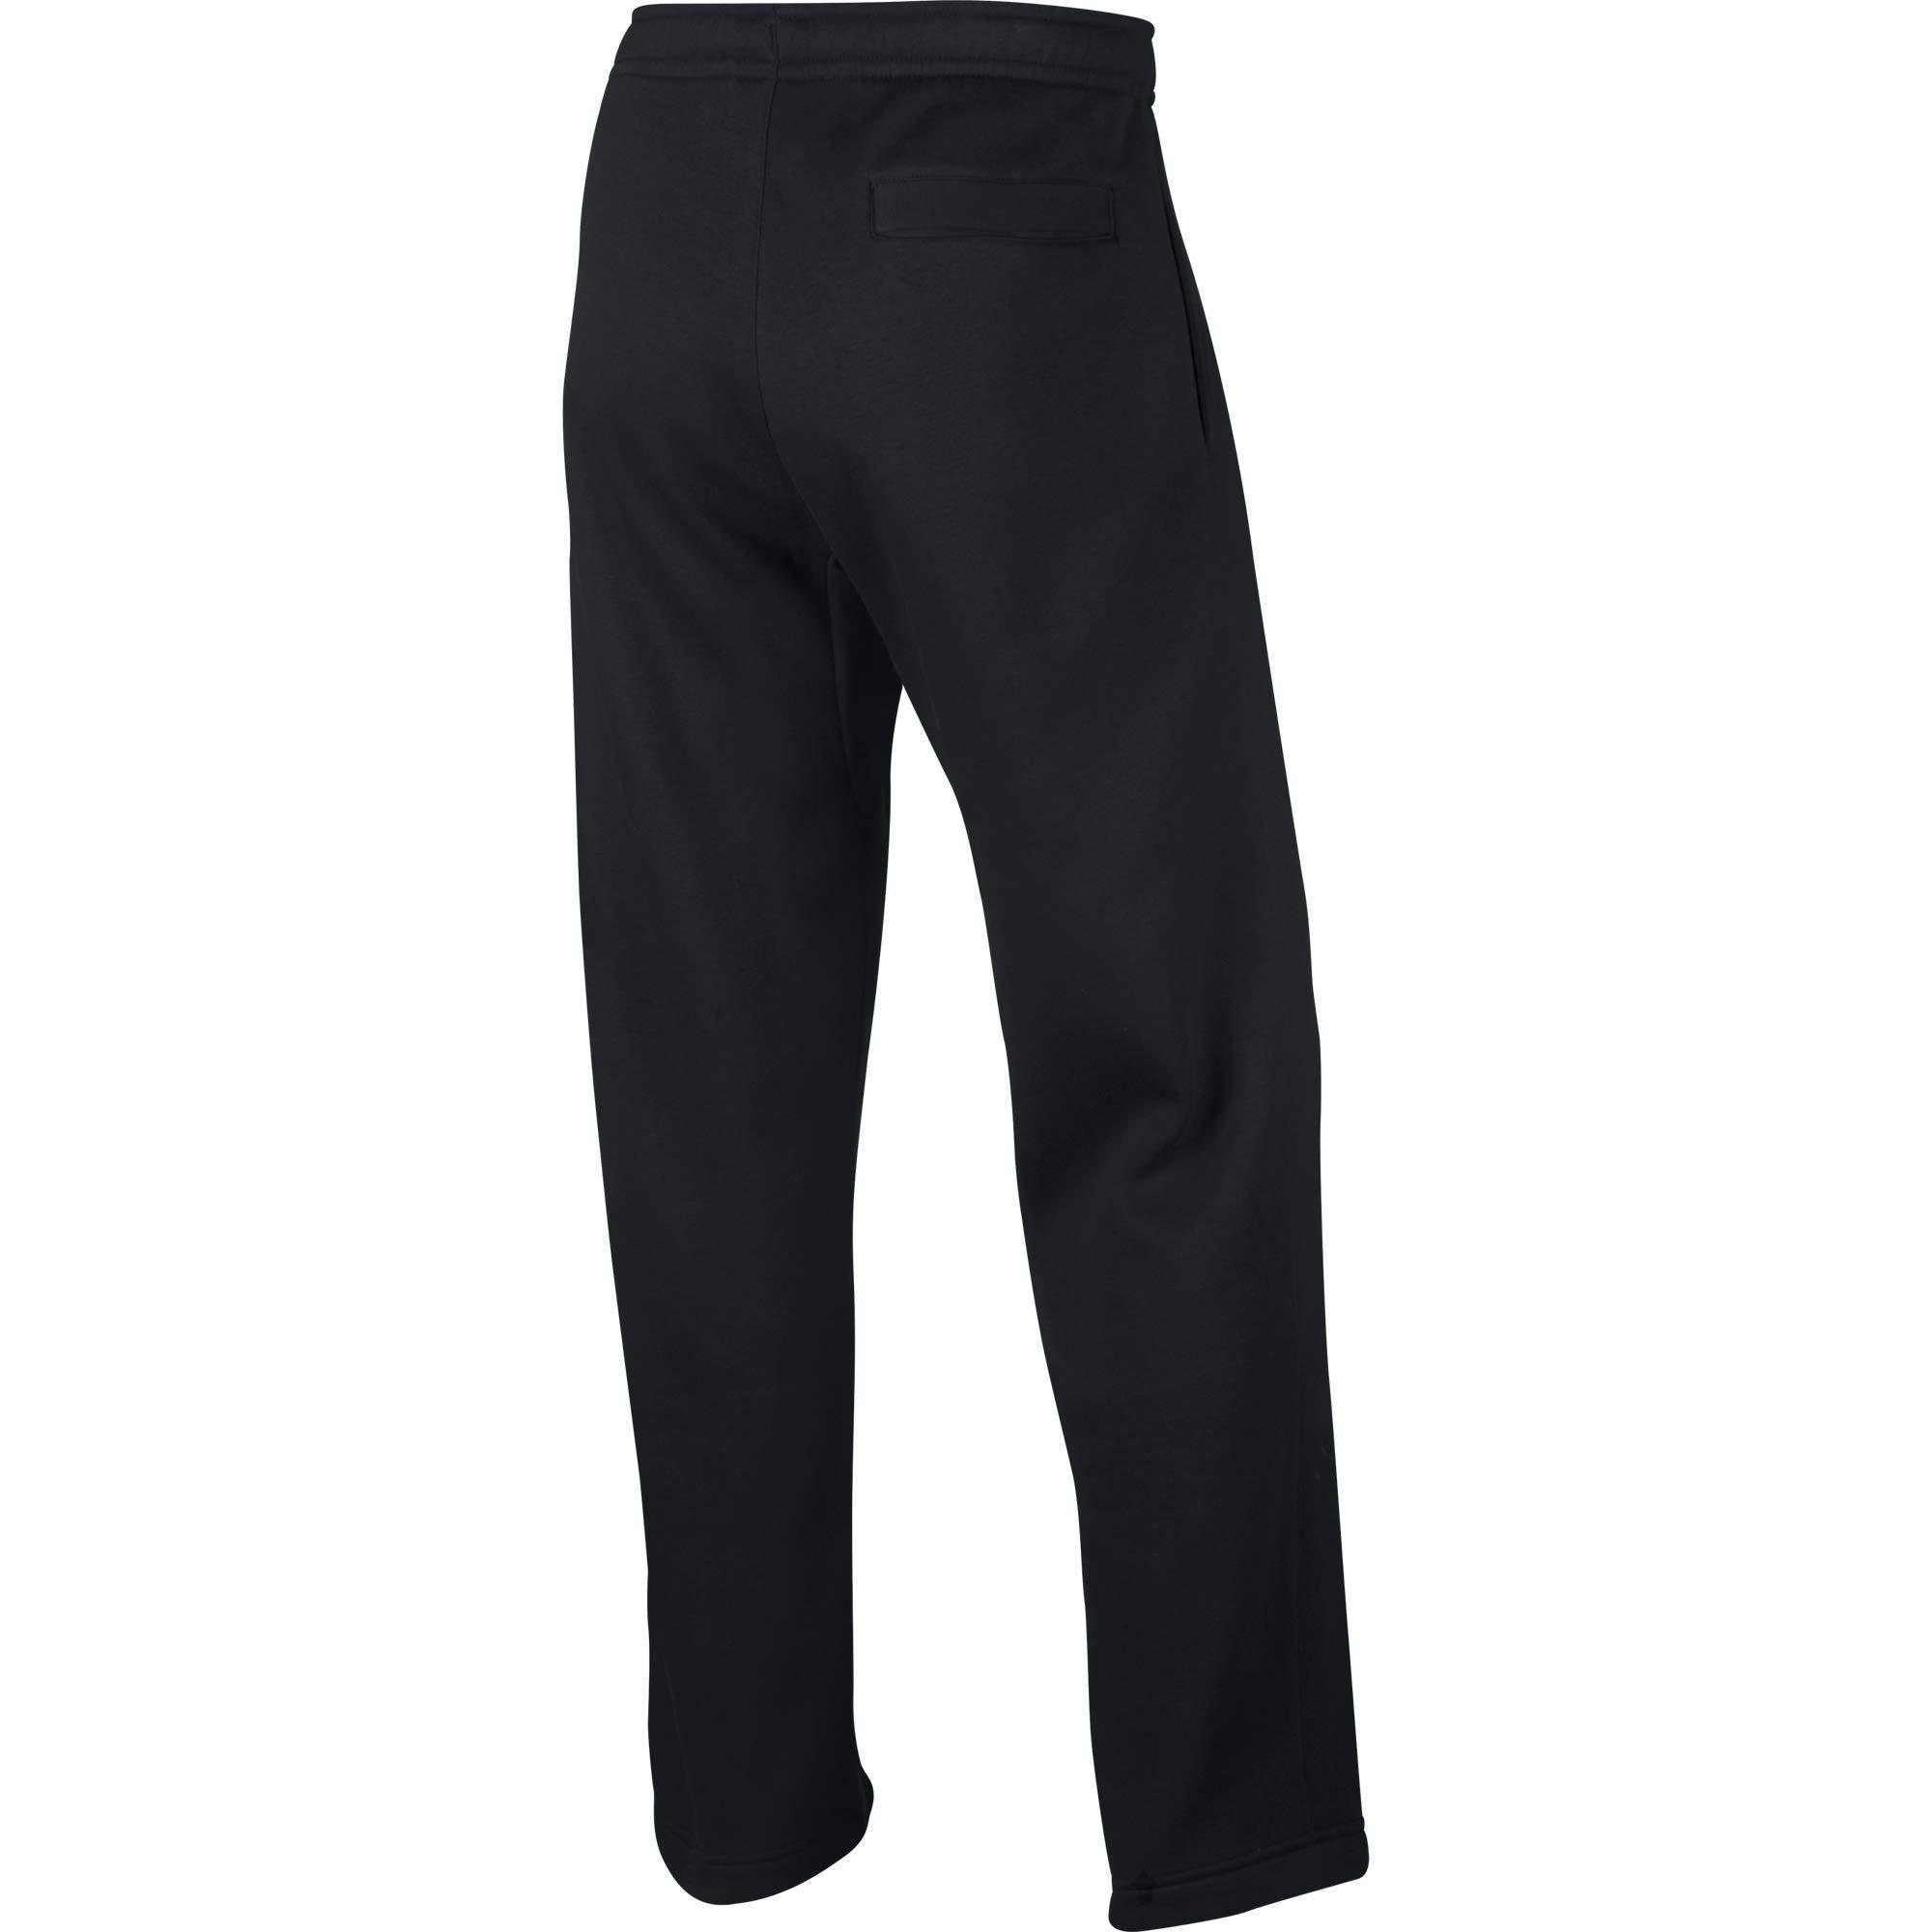 Nike Men's Sportswear Open Hem Club Pants, Black/White, Medium Tall by Nike